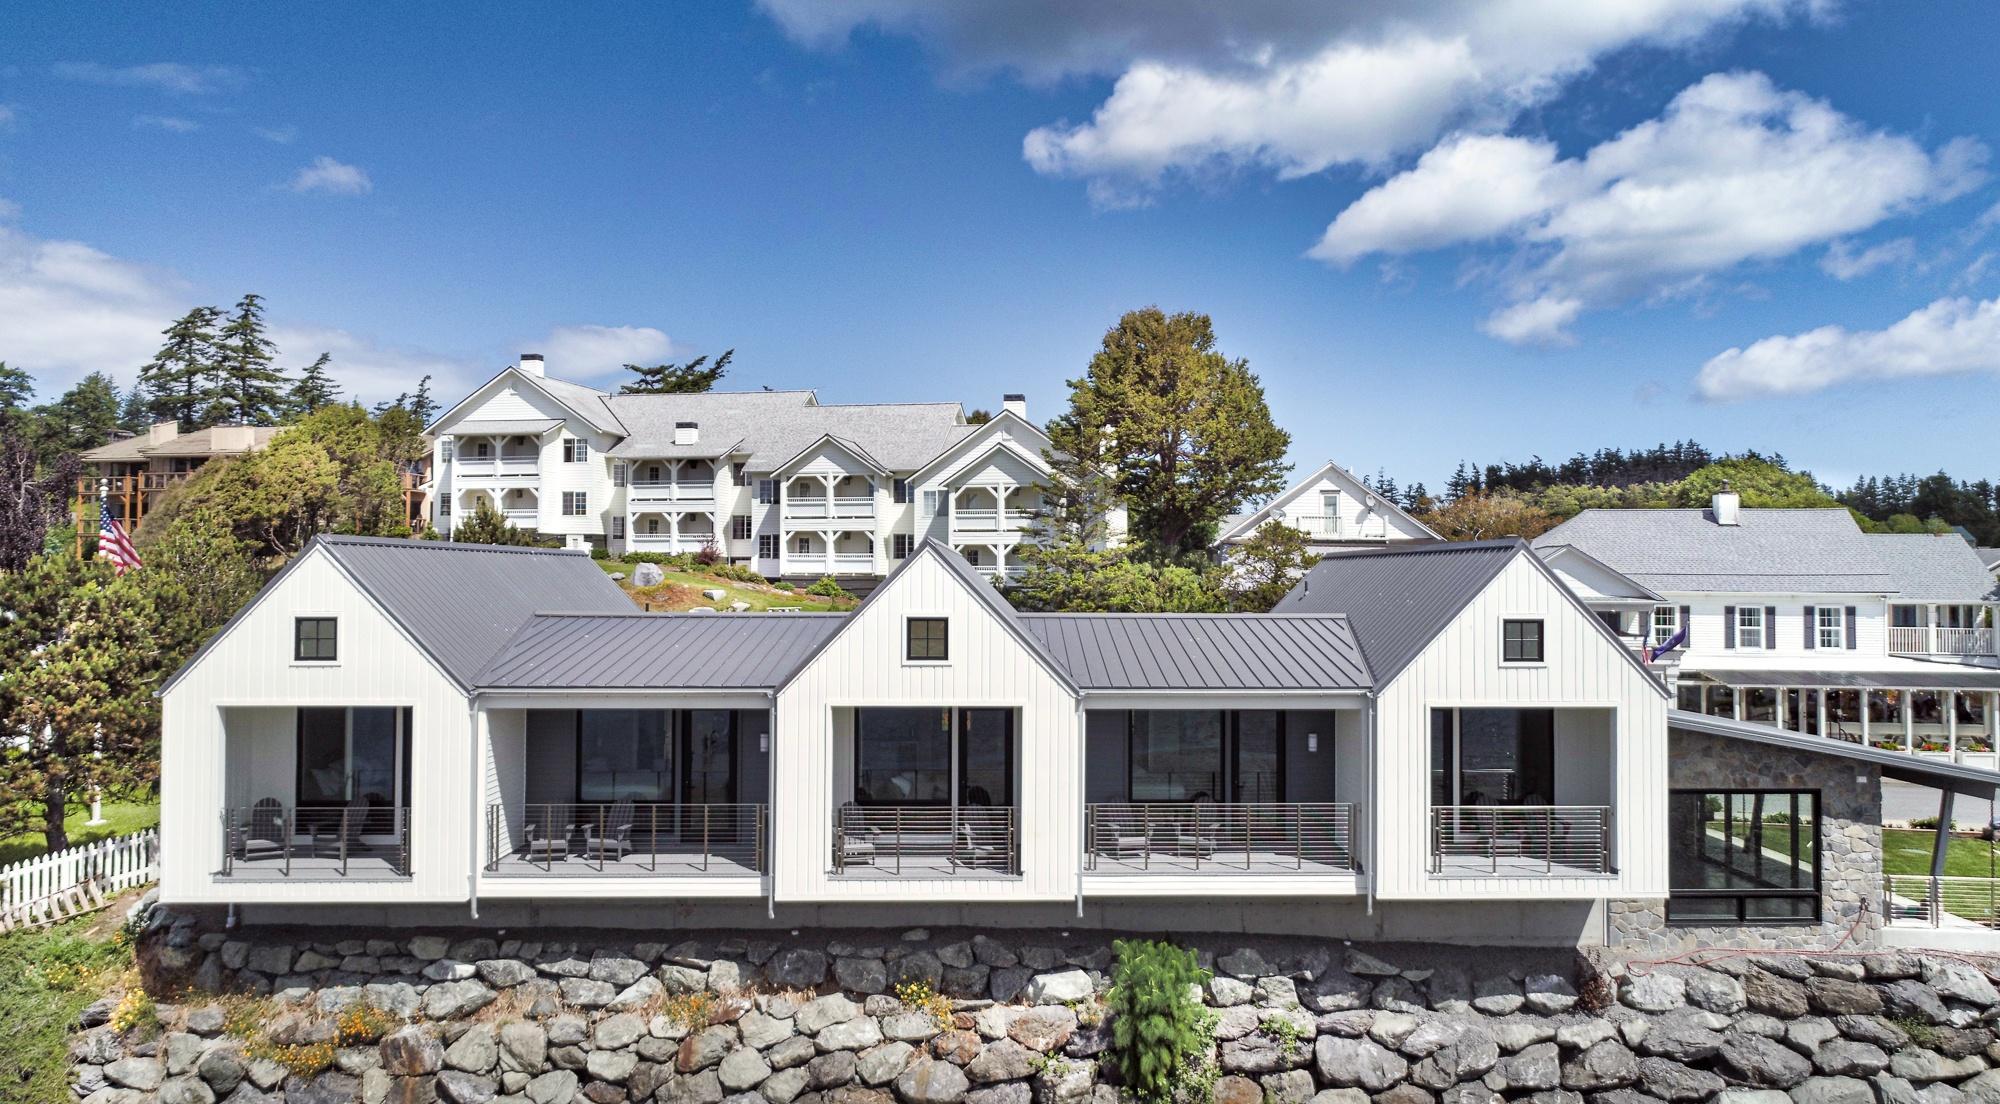 Waters_Edge-outlook-inn-hotel-orcas-island copy.jpg